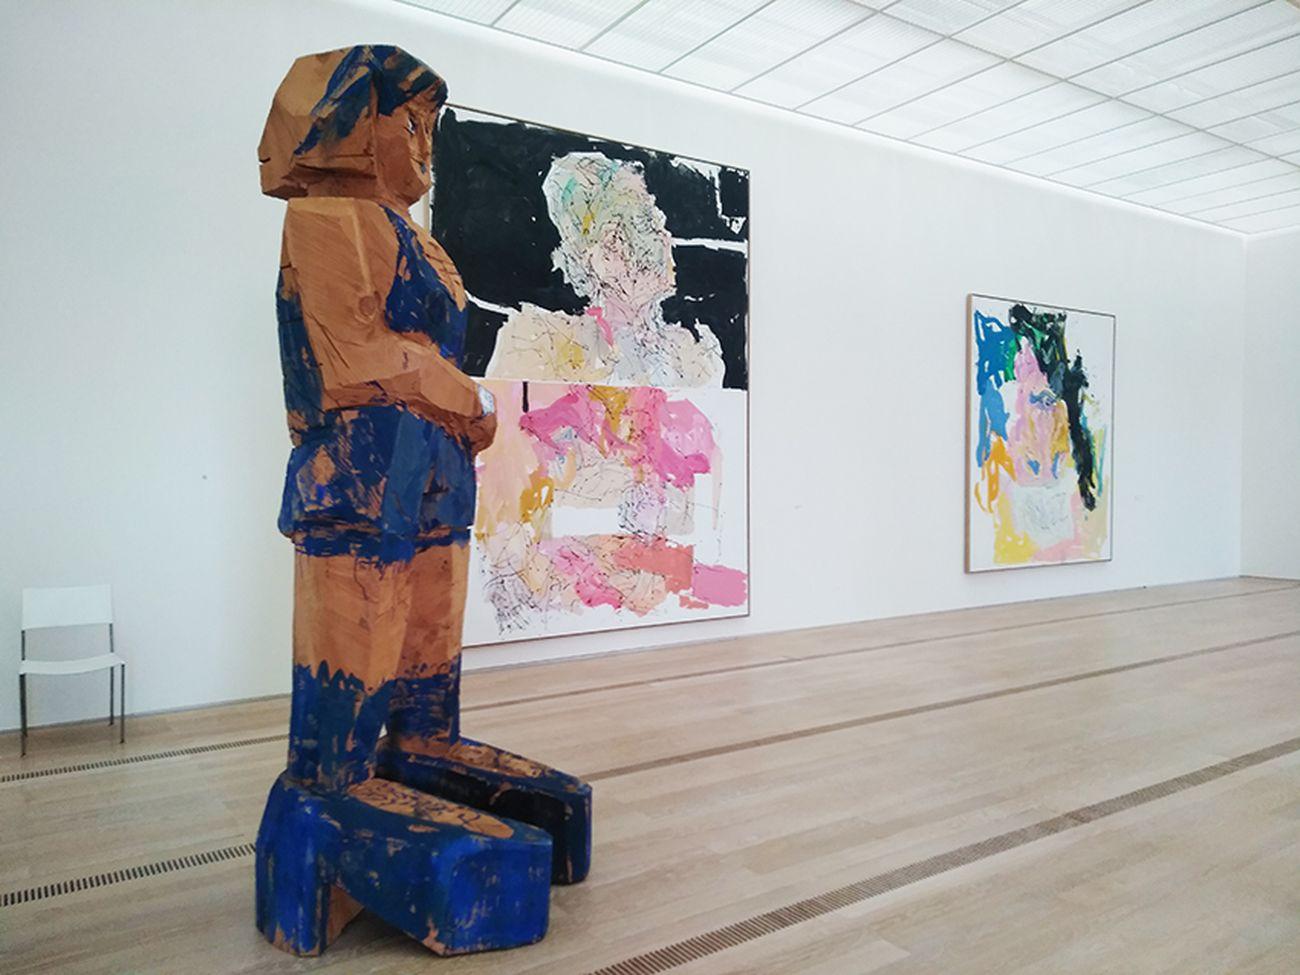 Baselitz. Exhibition view at Fondation Beyeler, Riehen 2018. Photo Daniele Perra